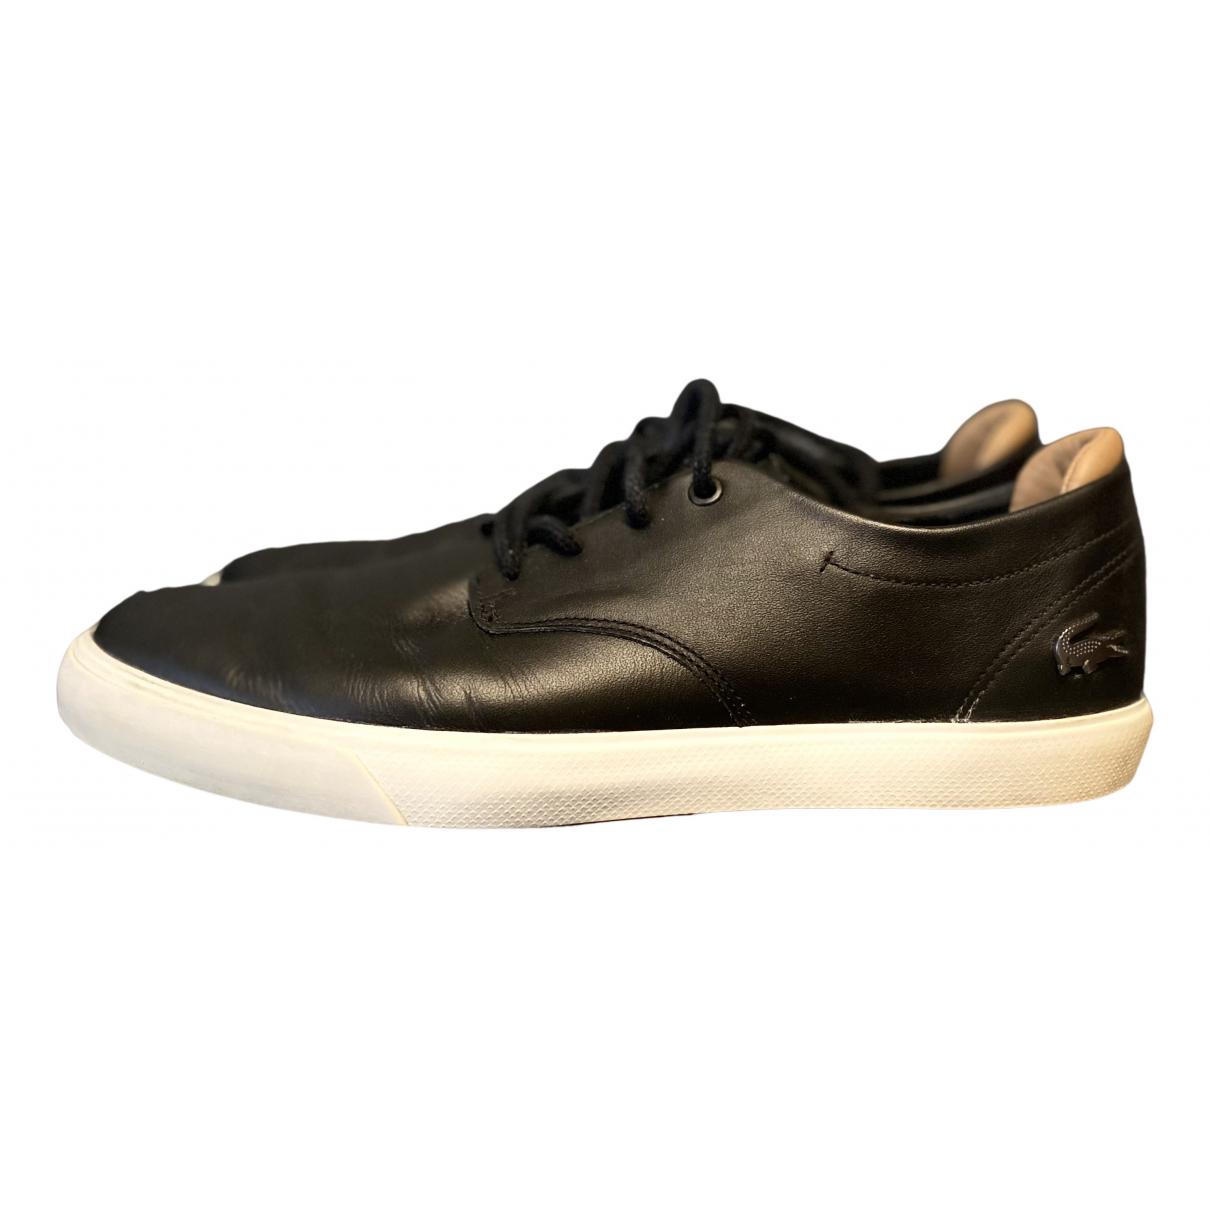 Lacoste \N Sneakers in  Schwarz Leder